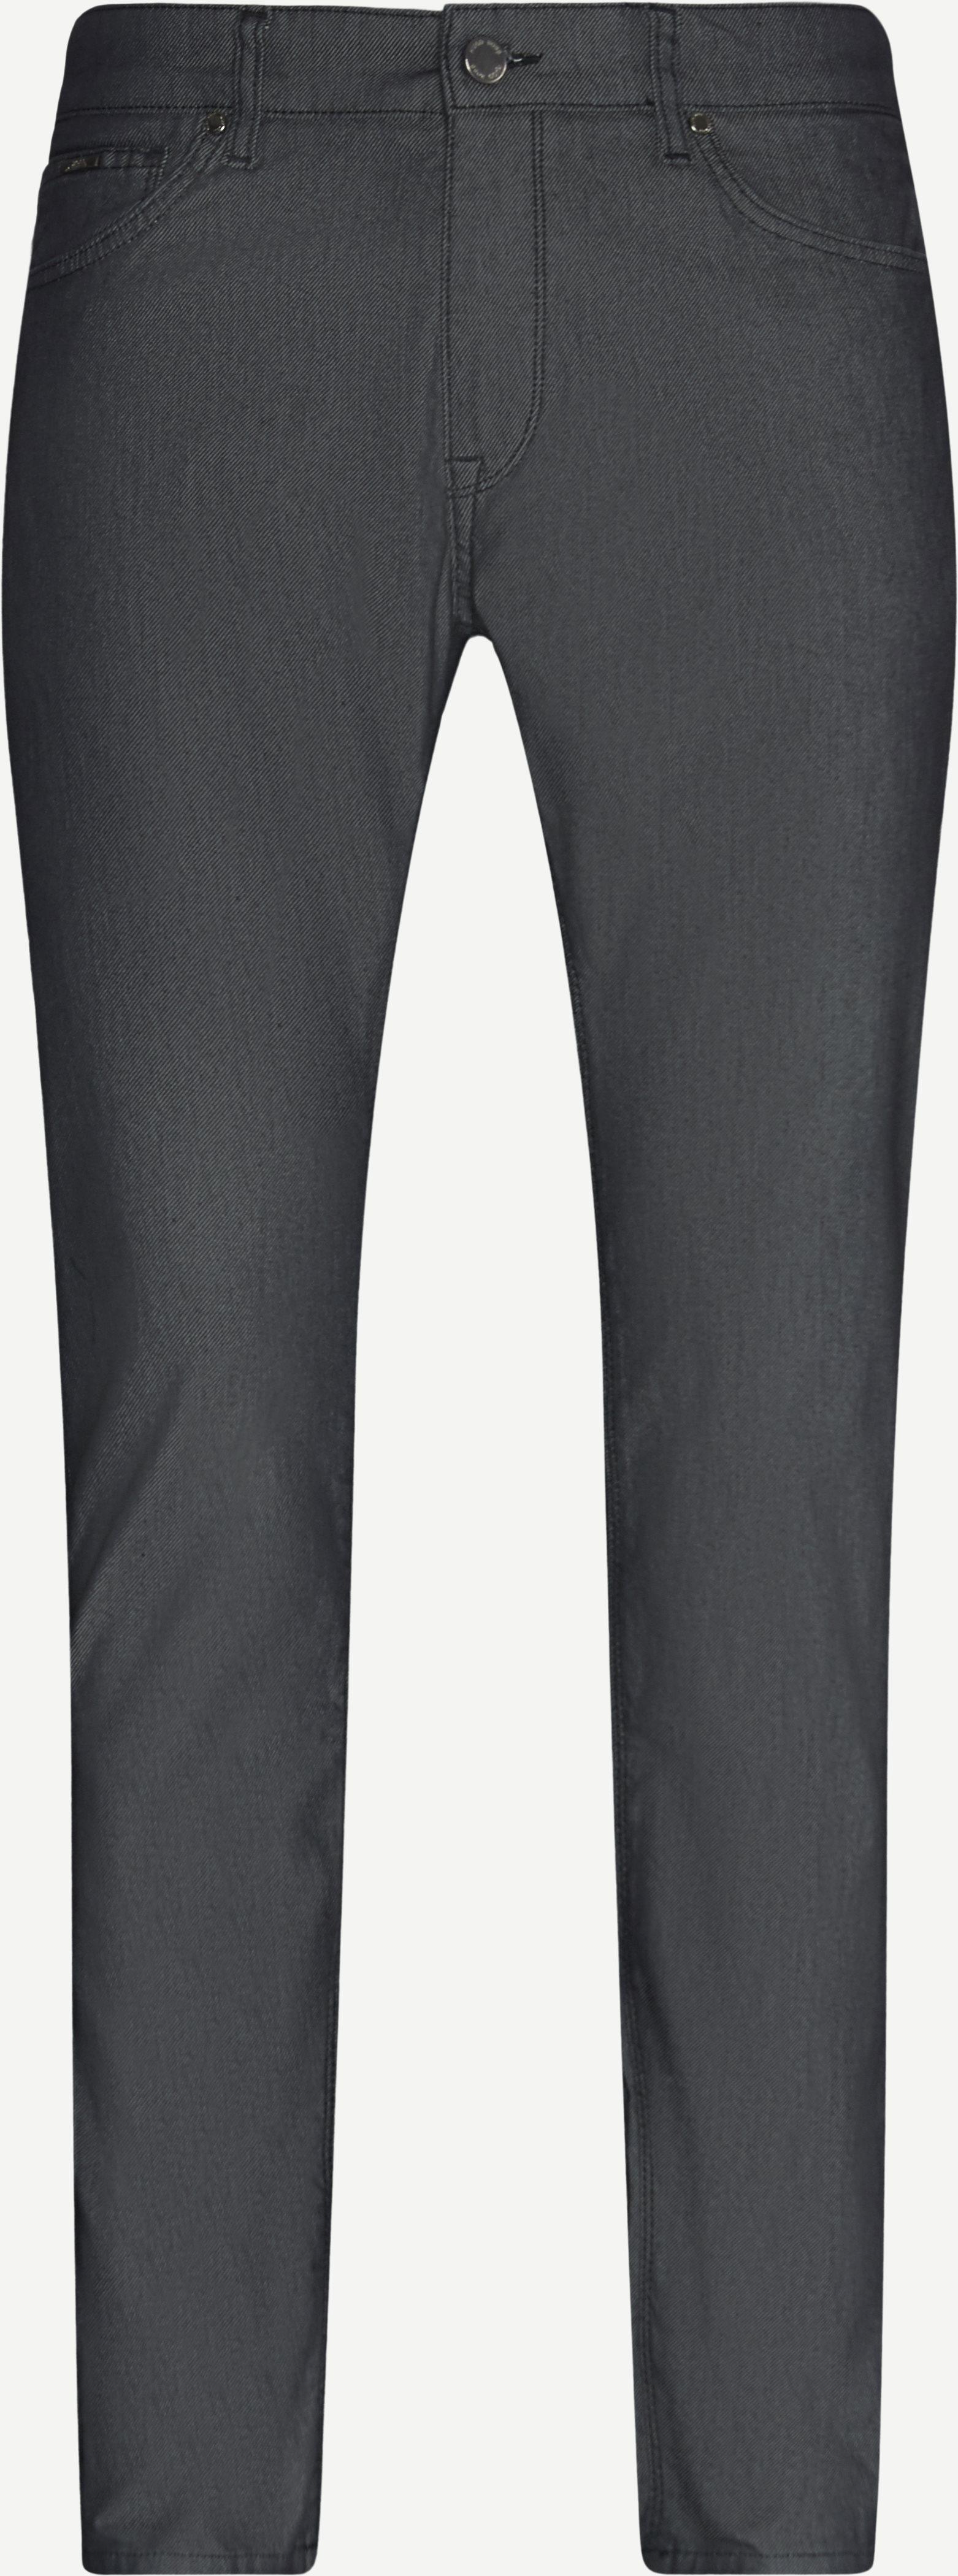 Maine 3 Jeans - Jeans - Regular - Sort